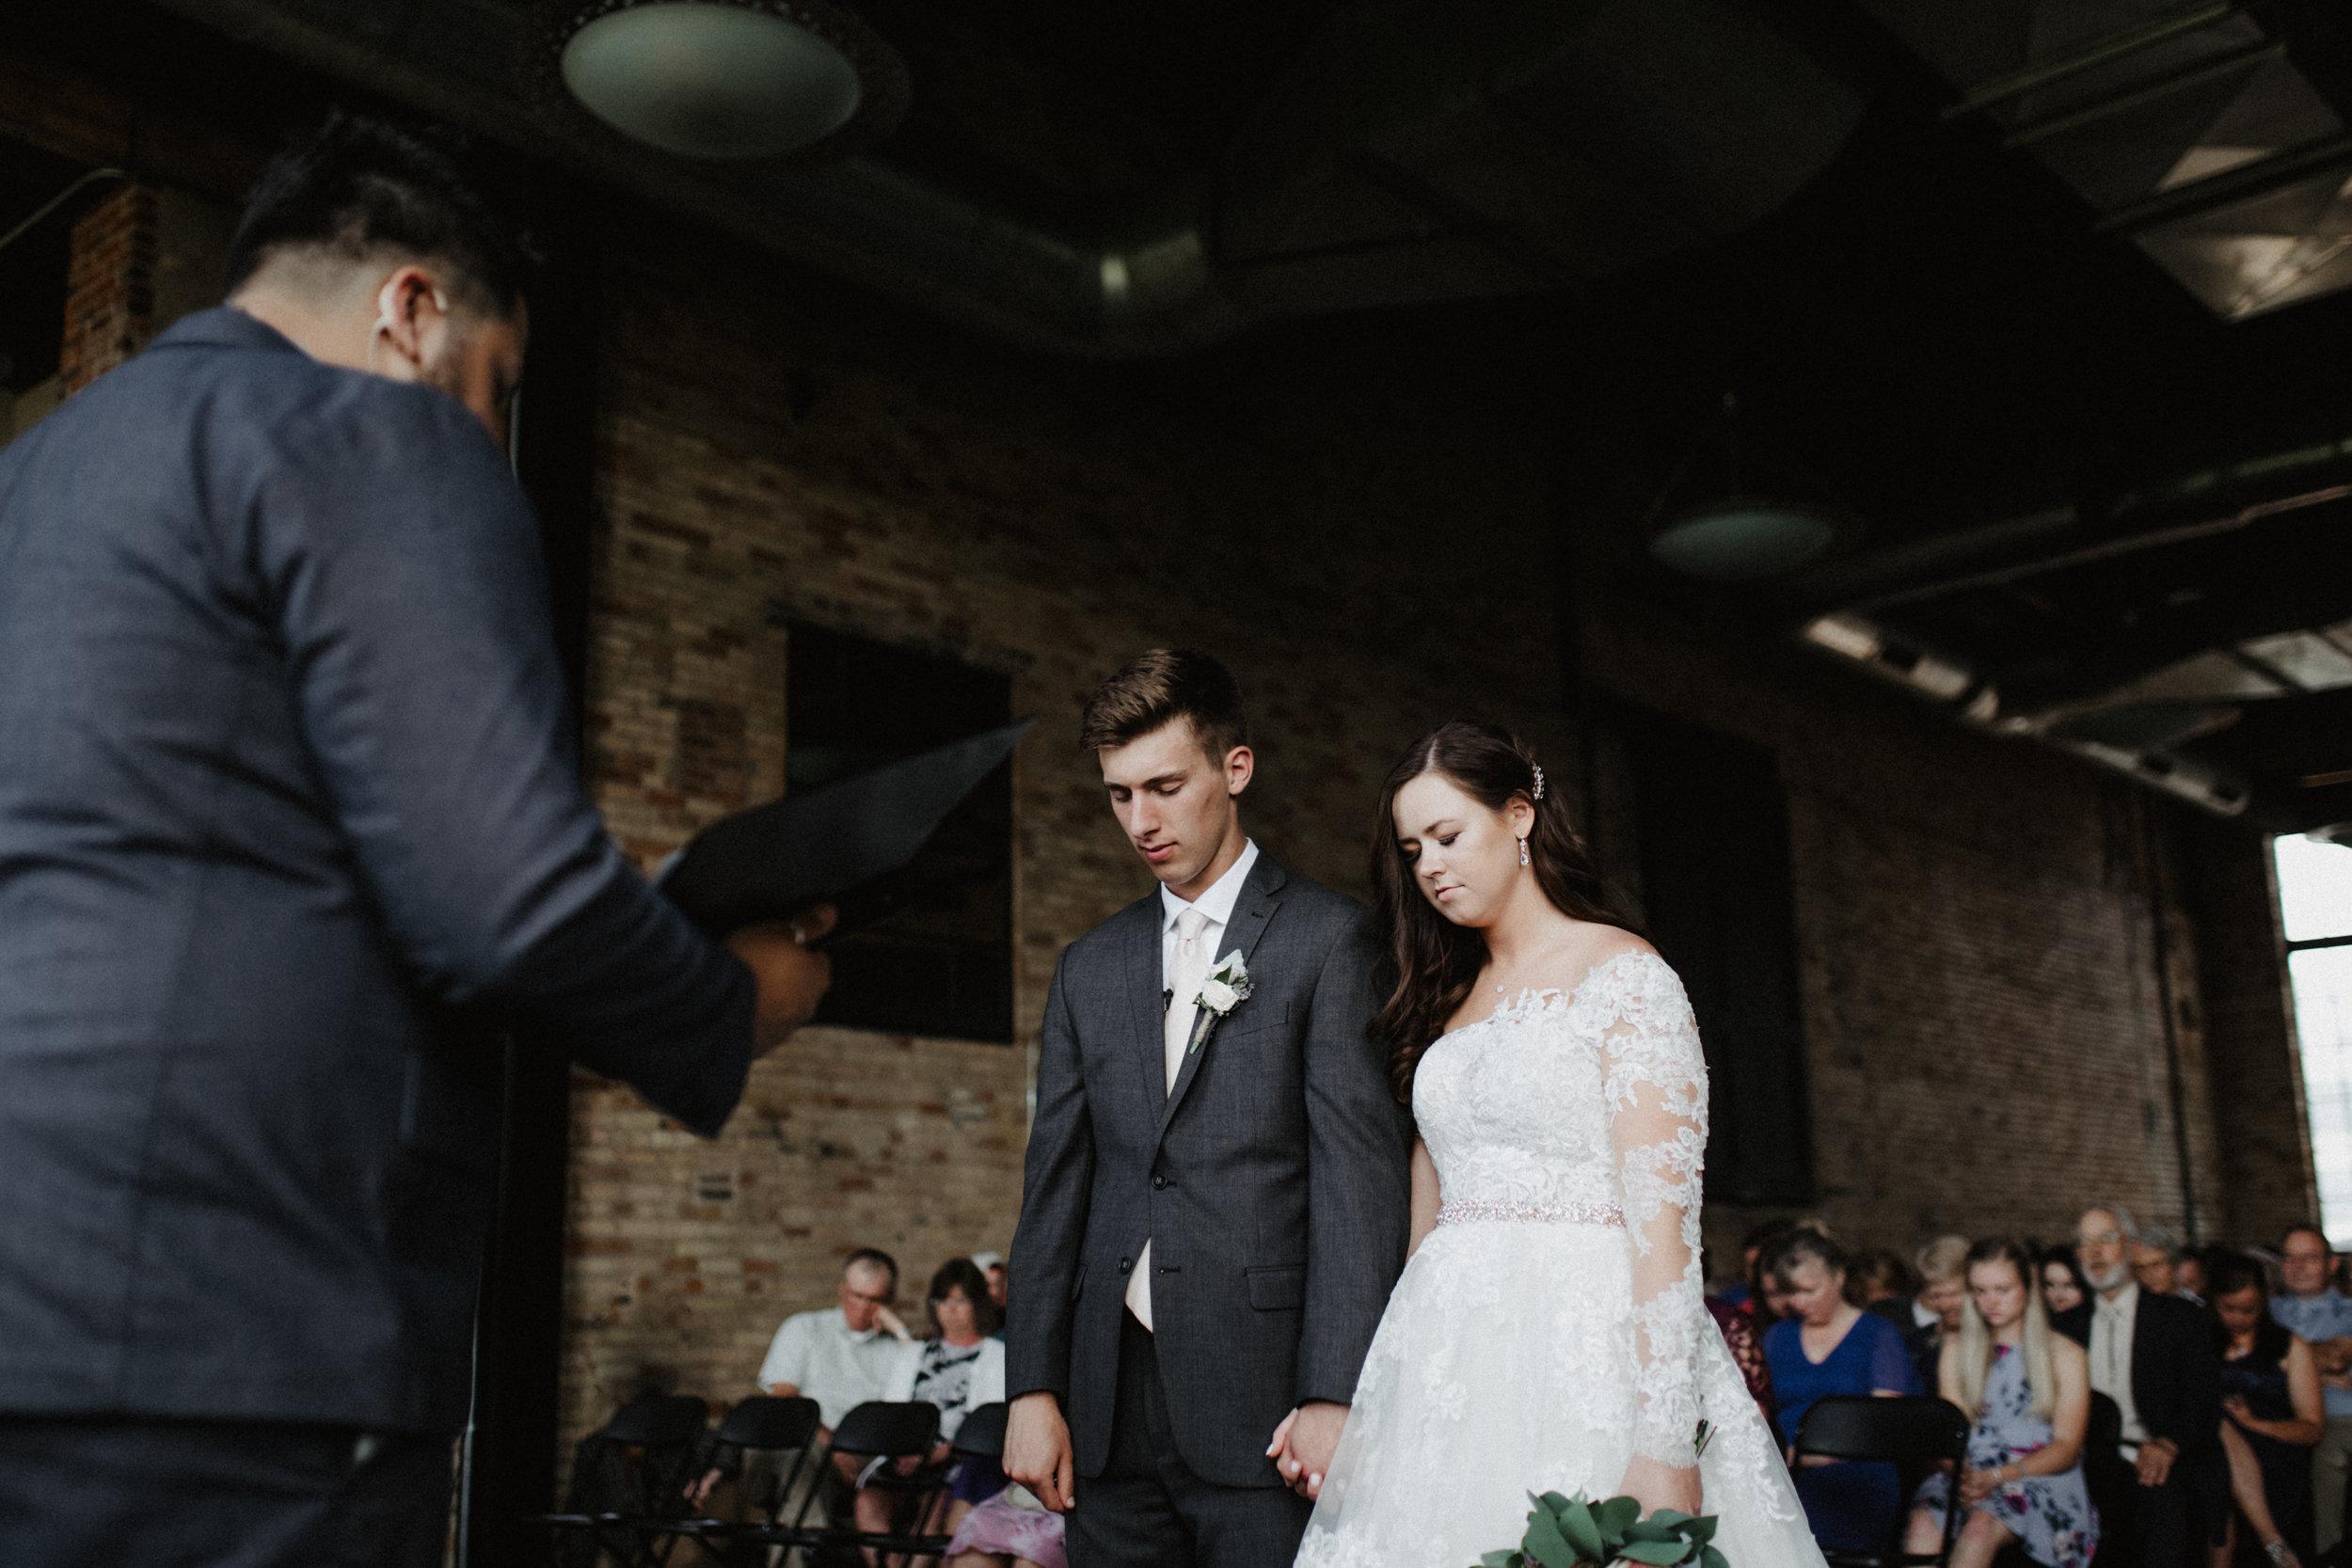 GRAYCENTOMHAMILTON-GRAND-RAPIDS-WEDDING-PHOTOGRAPHY-49.jpg